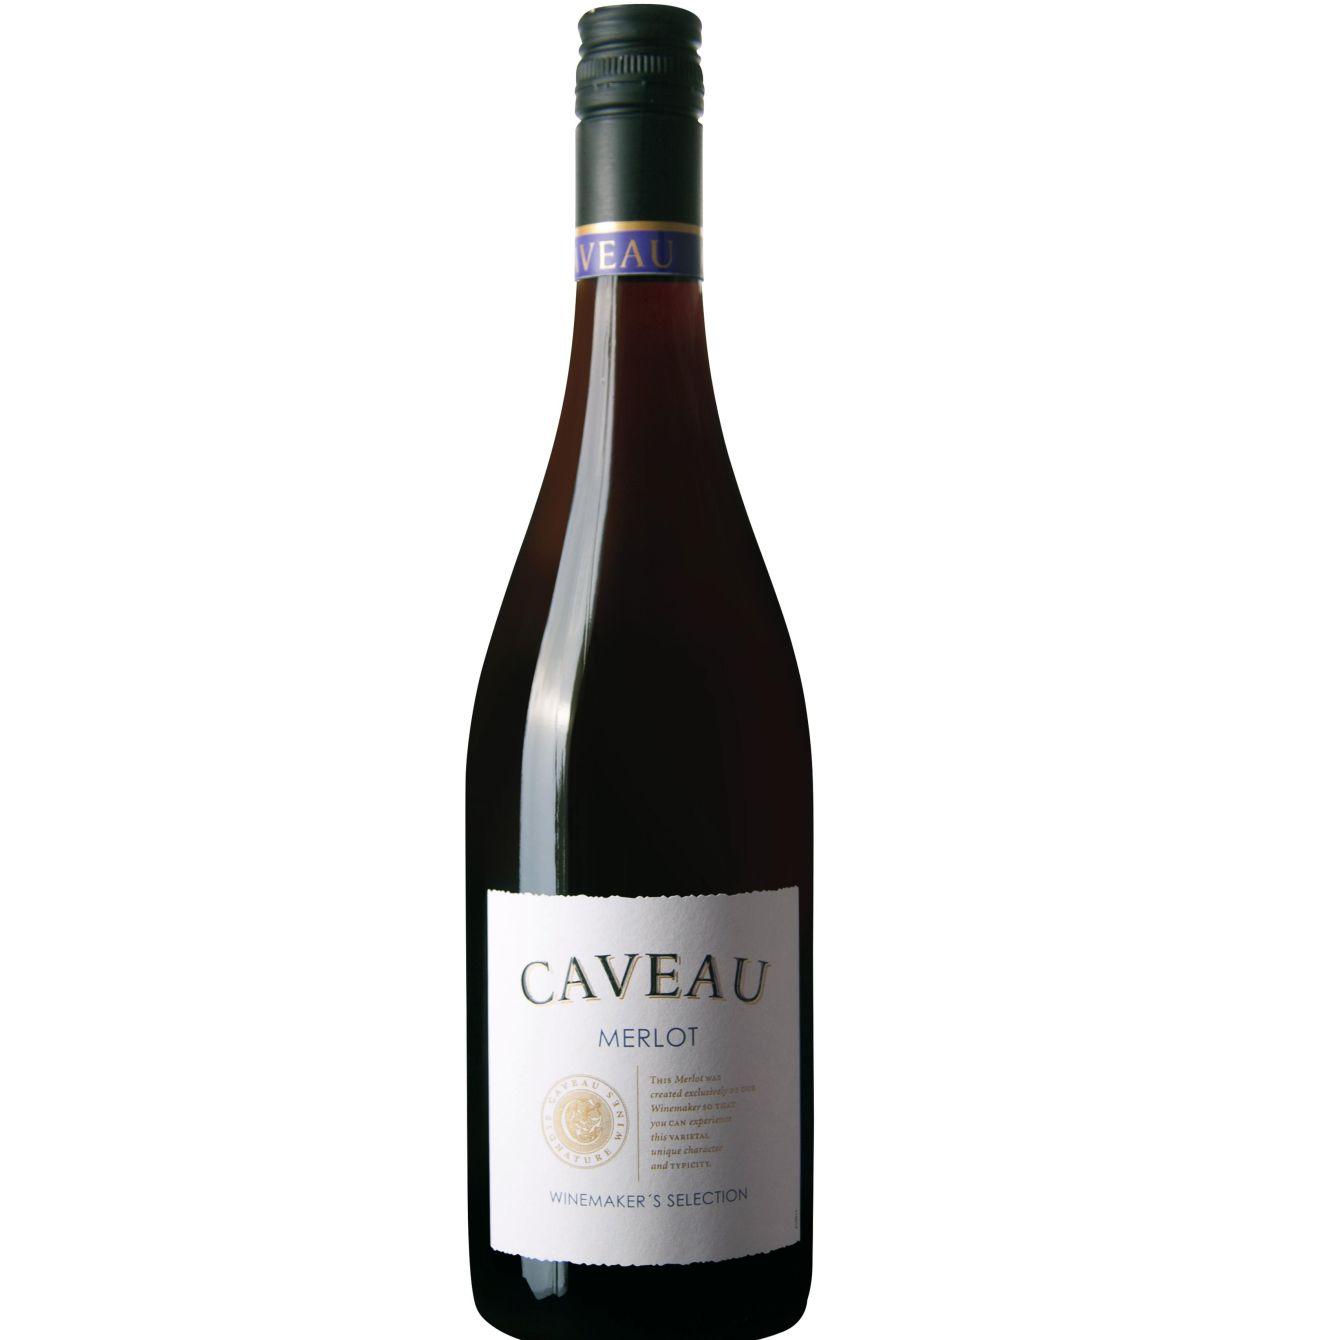 Caveau Merlot